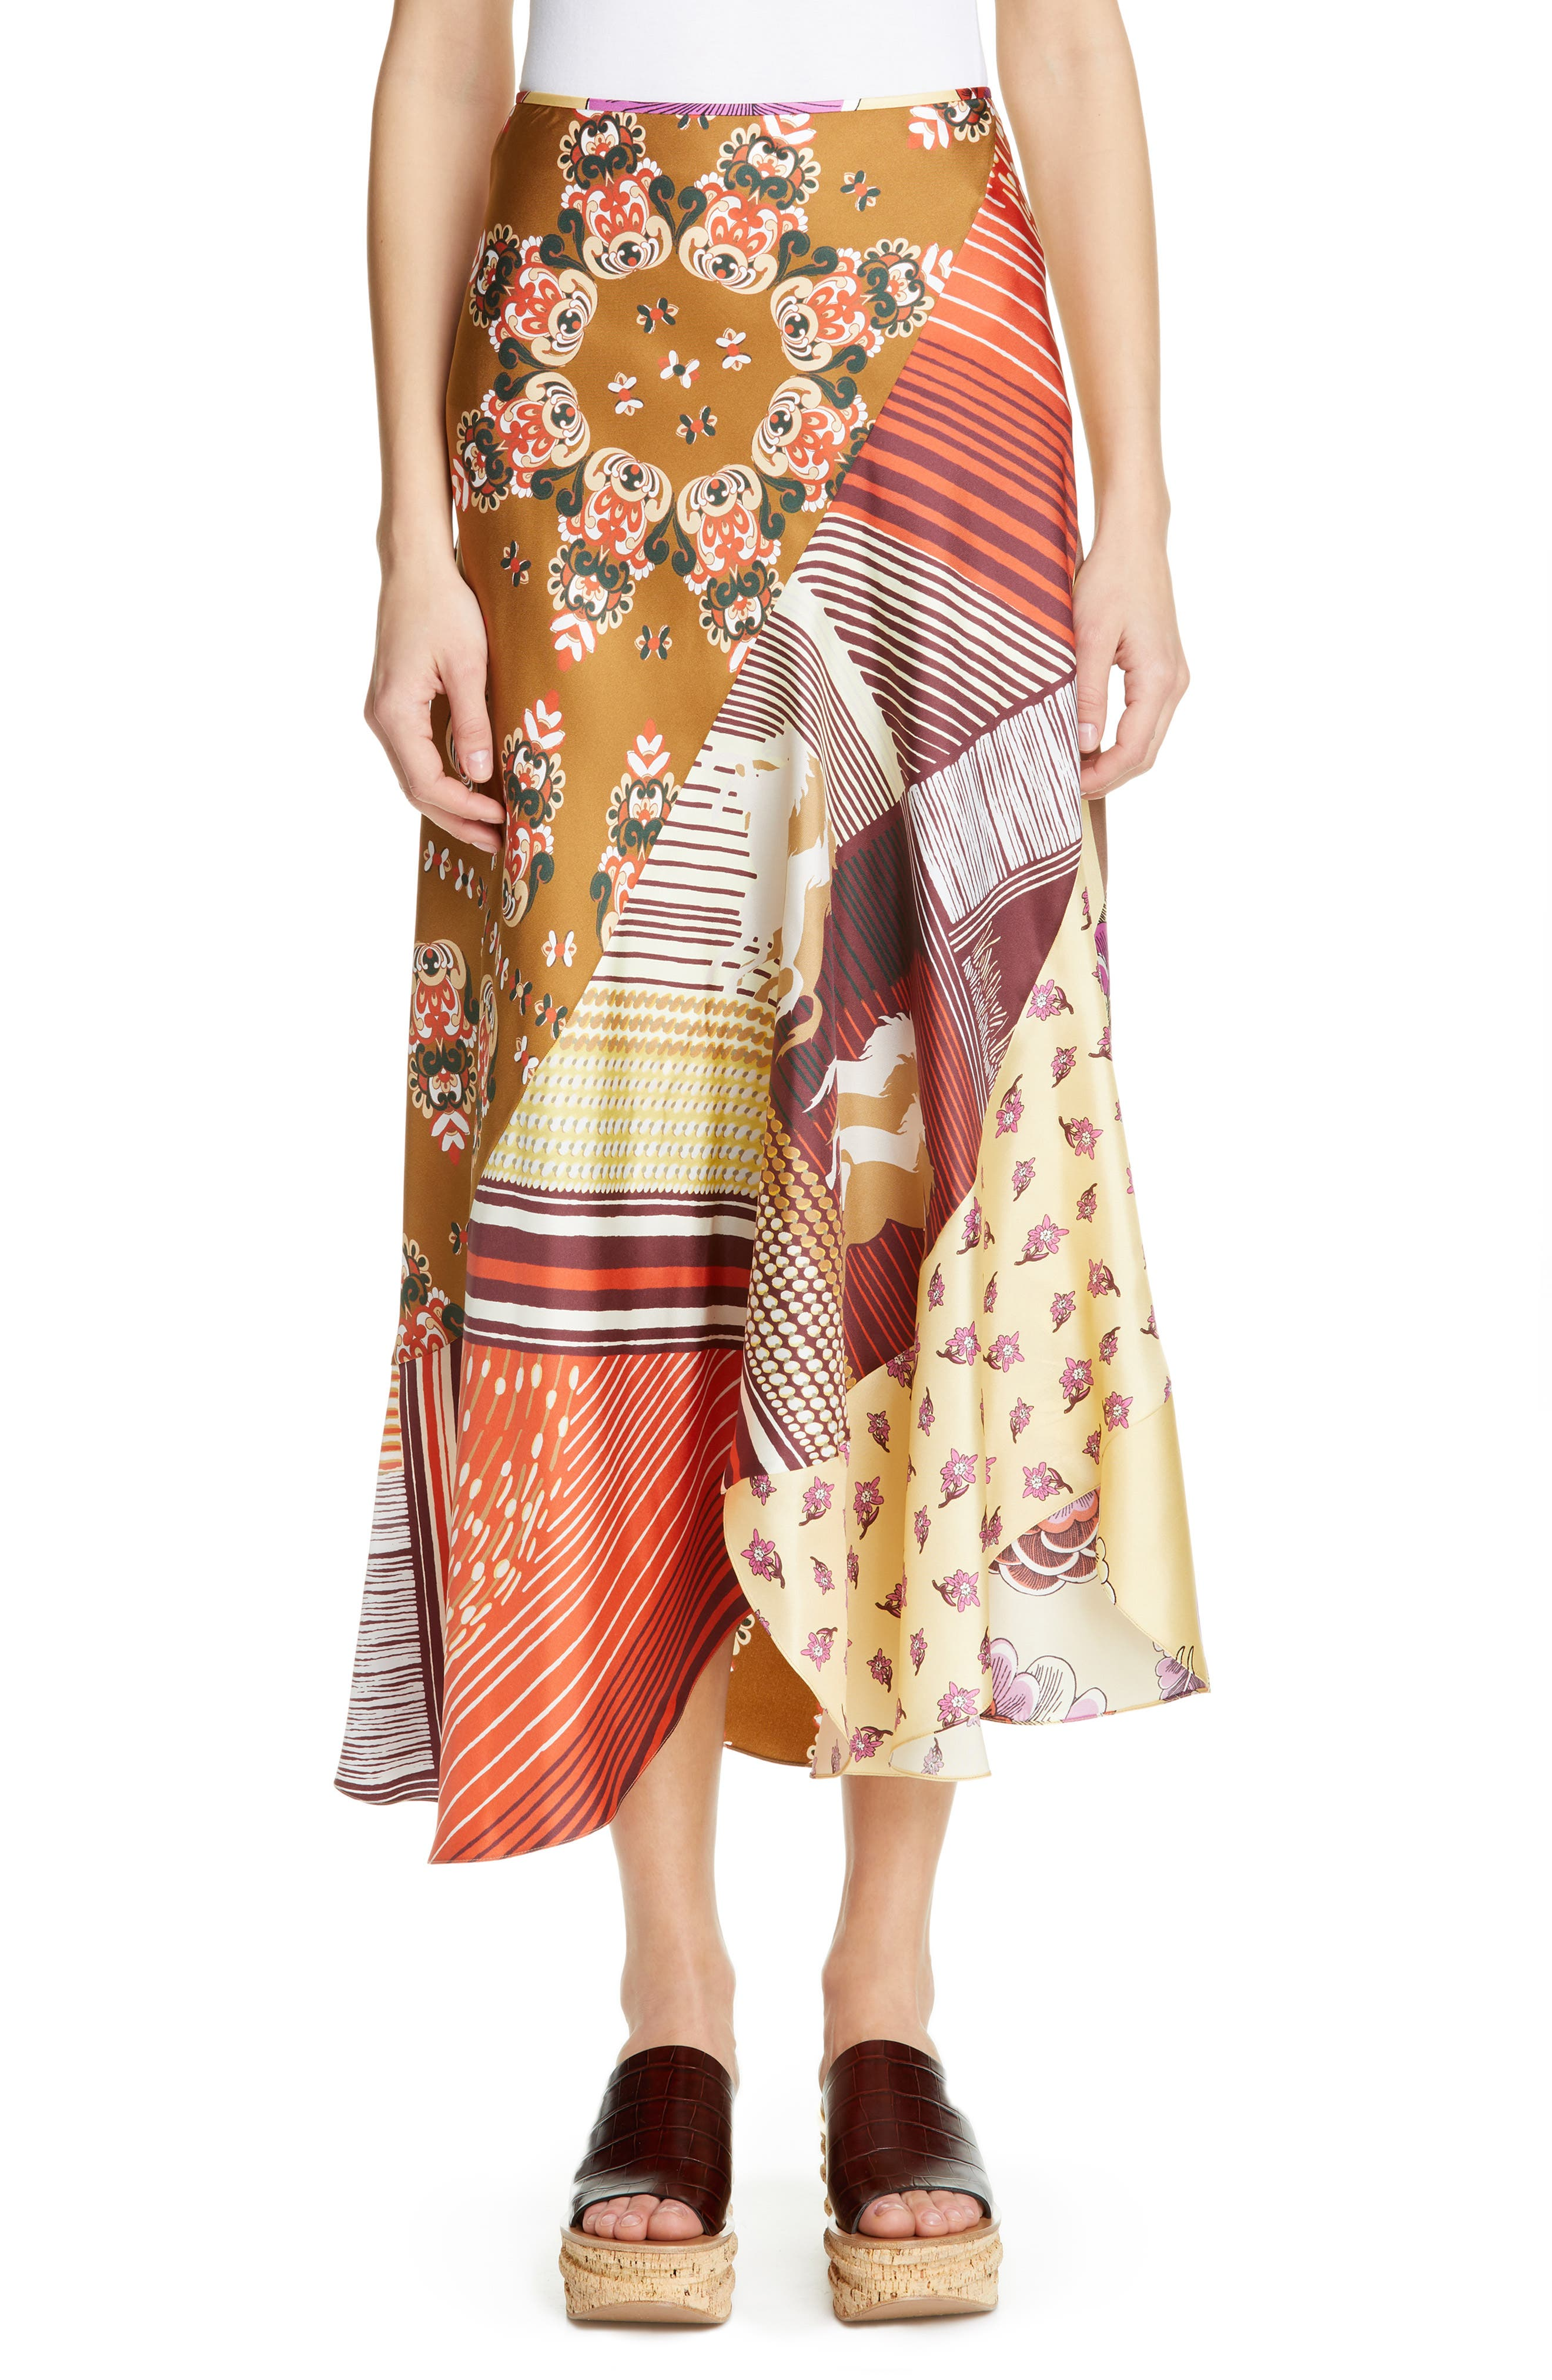 Mixed Print Bias Cut Silk Skirt, Main, color, 3ZA-MULTICOLOR GREEN 1